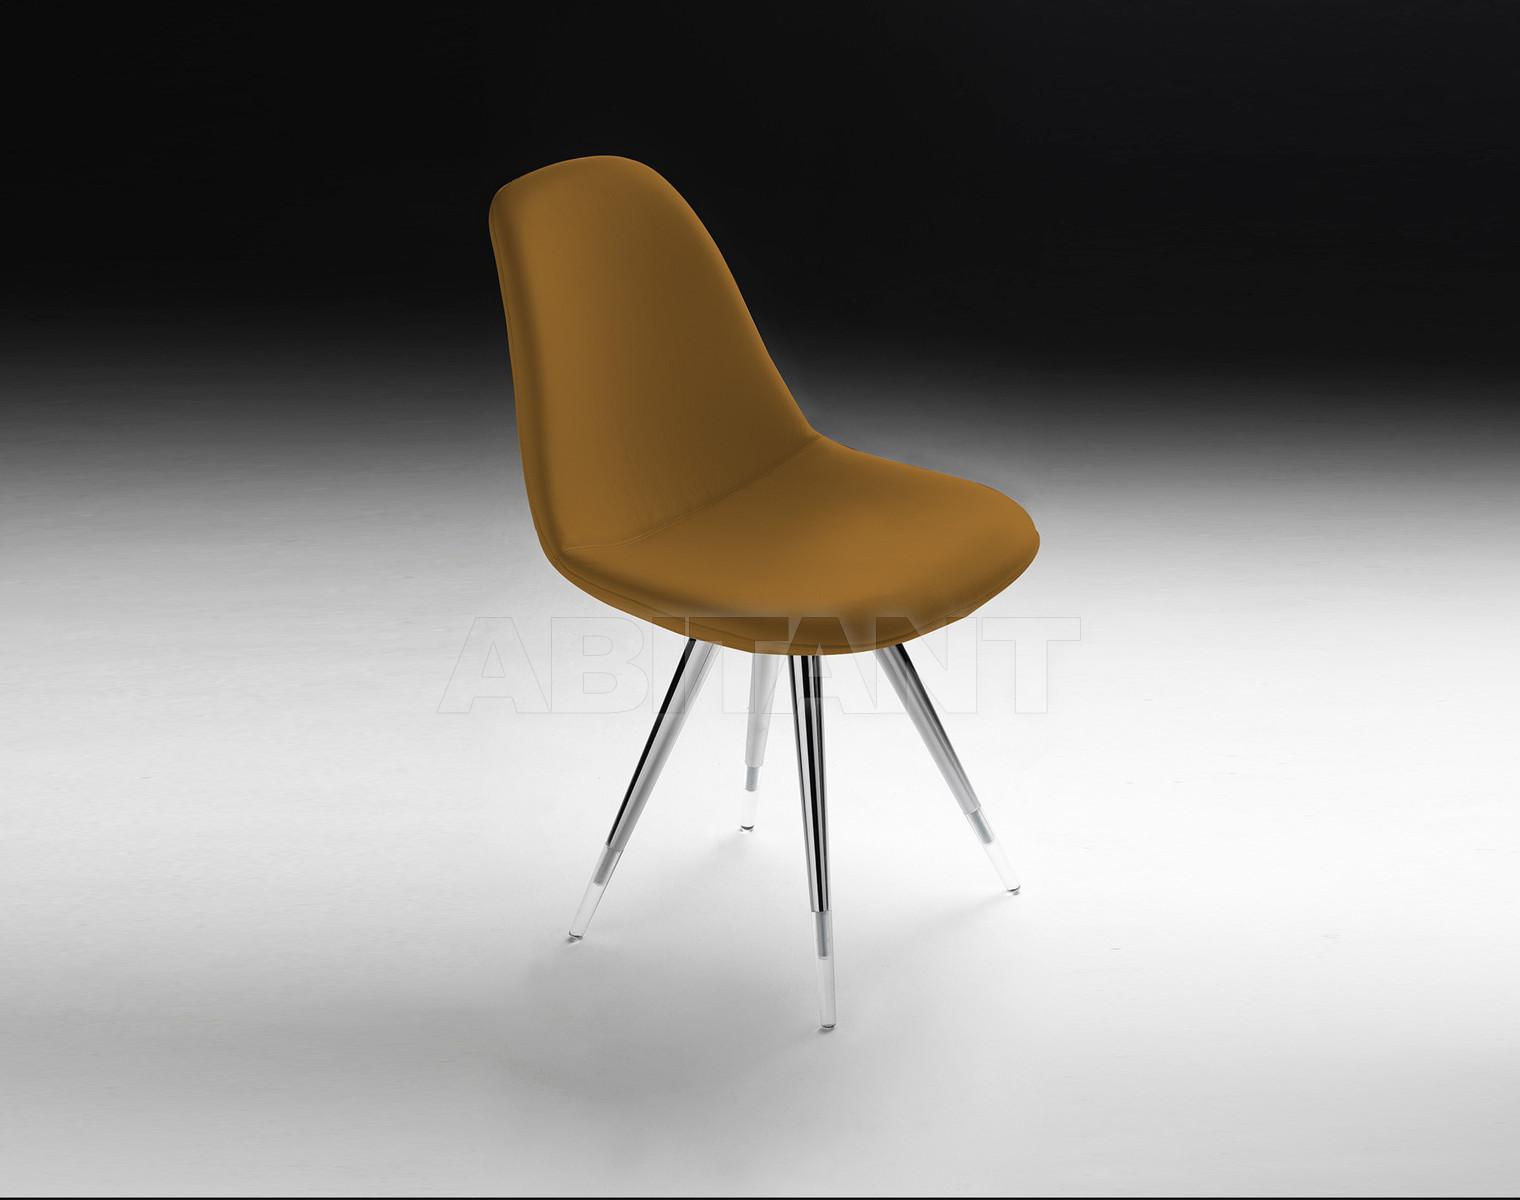 Купить Стул Kubikoff Gino Lemson & Ruud Bos Angel'POP'Chair' 17